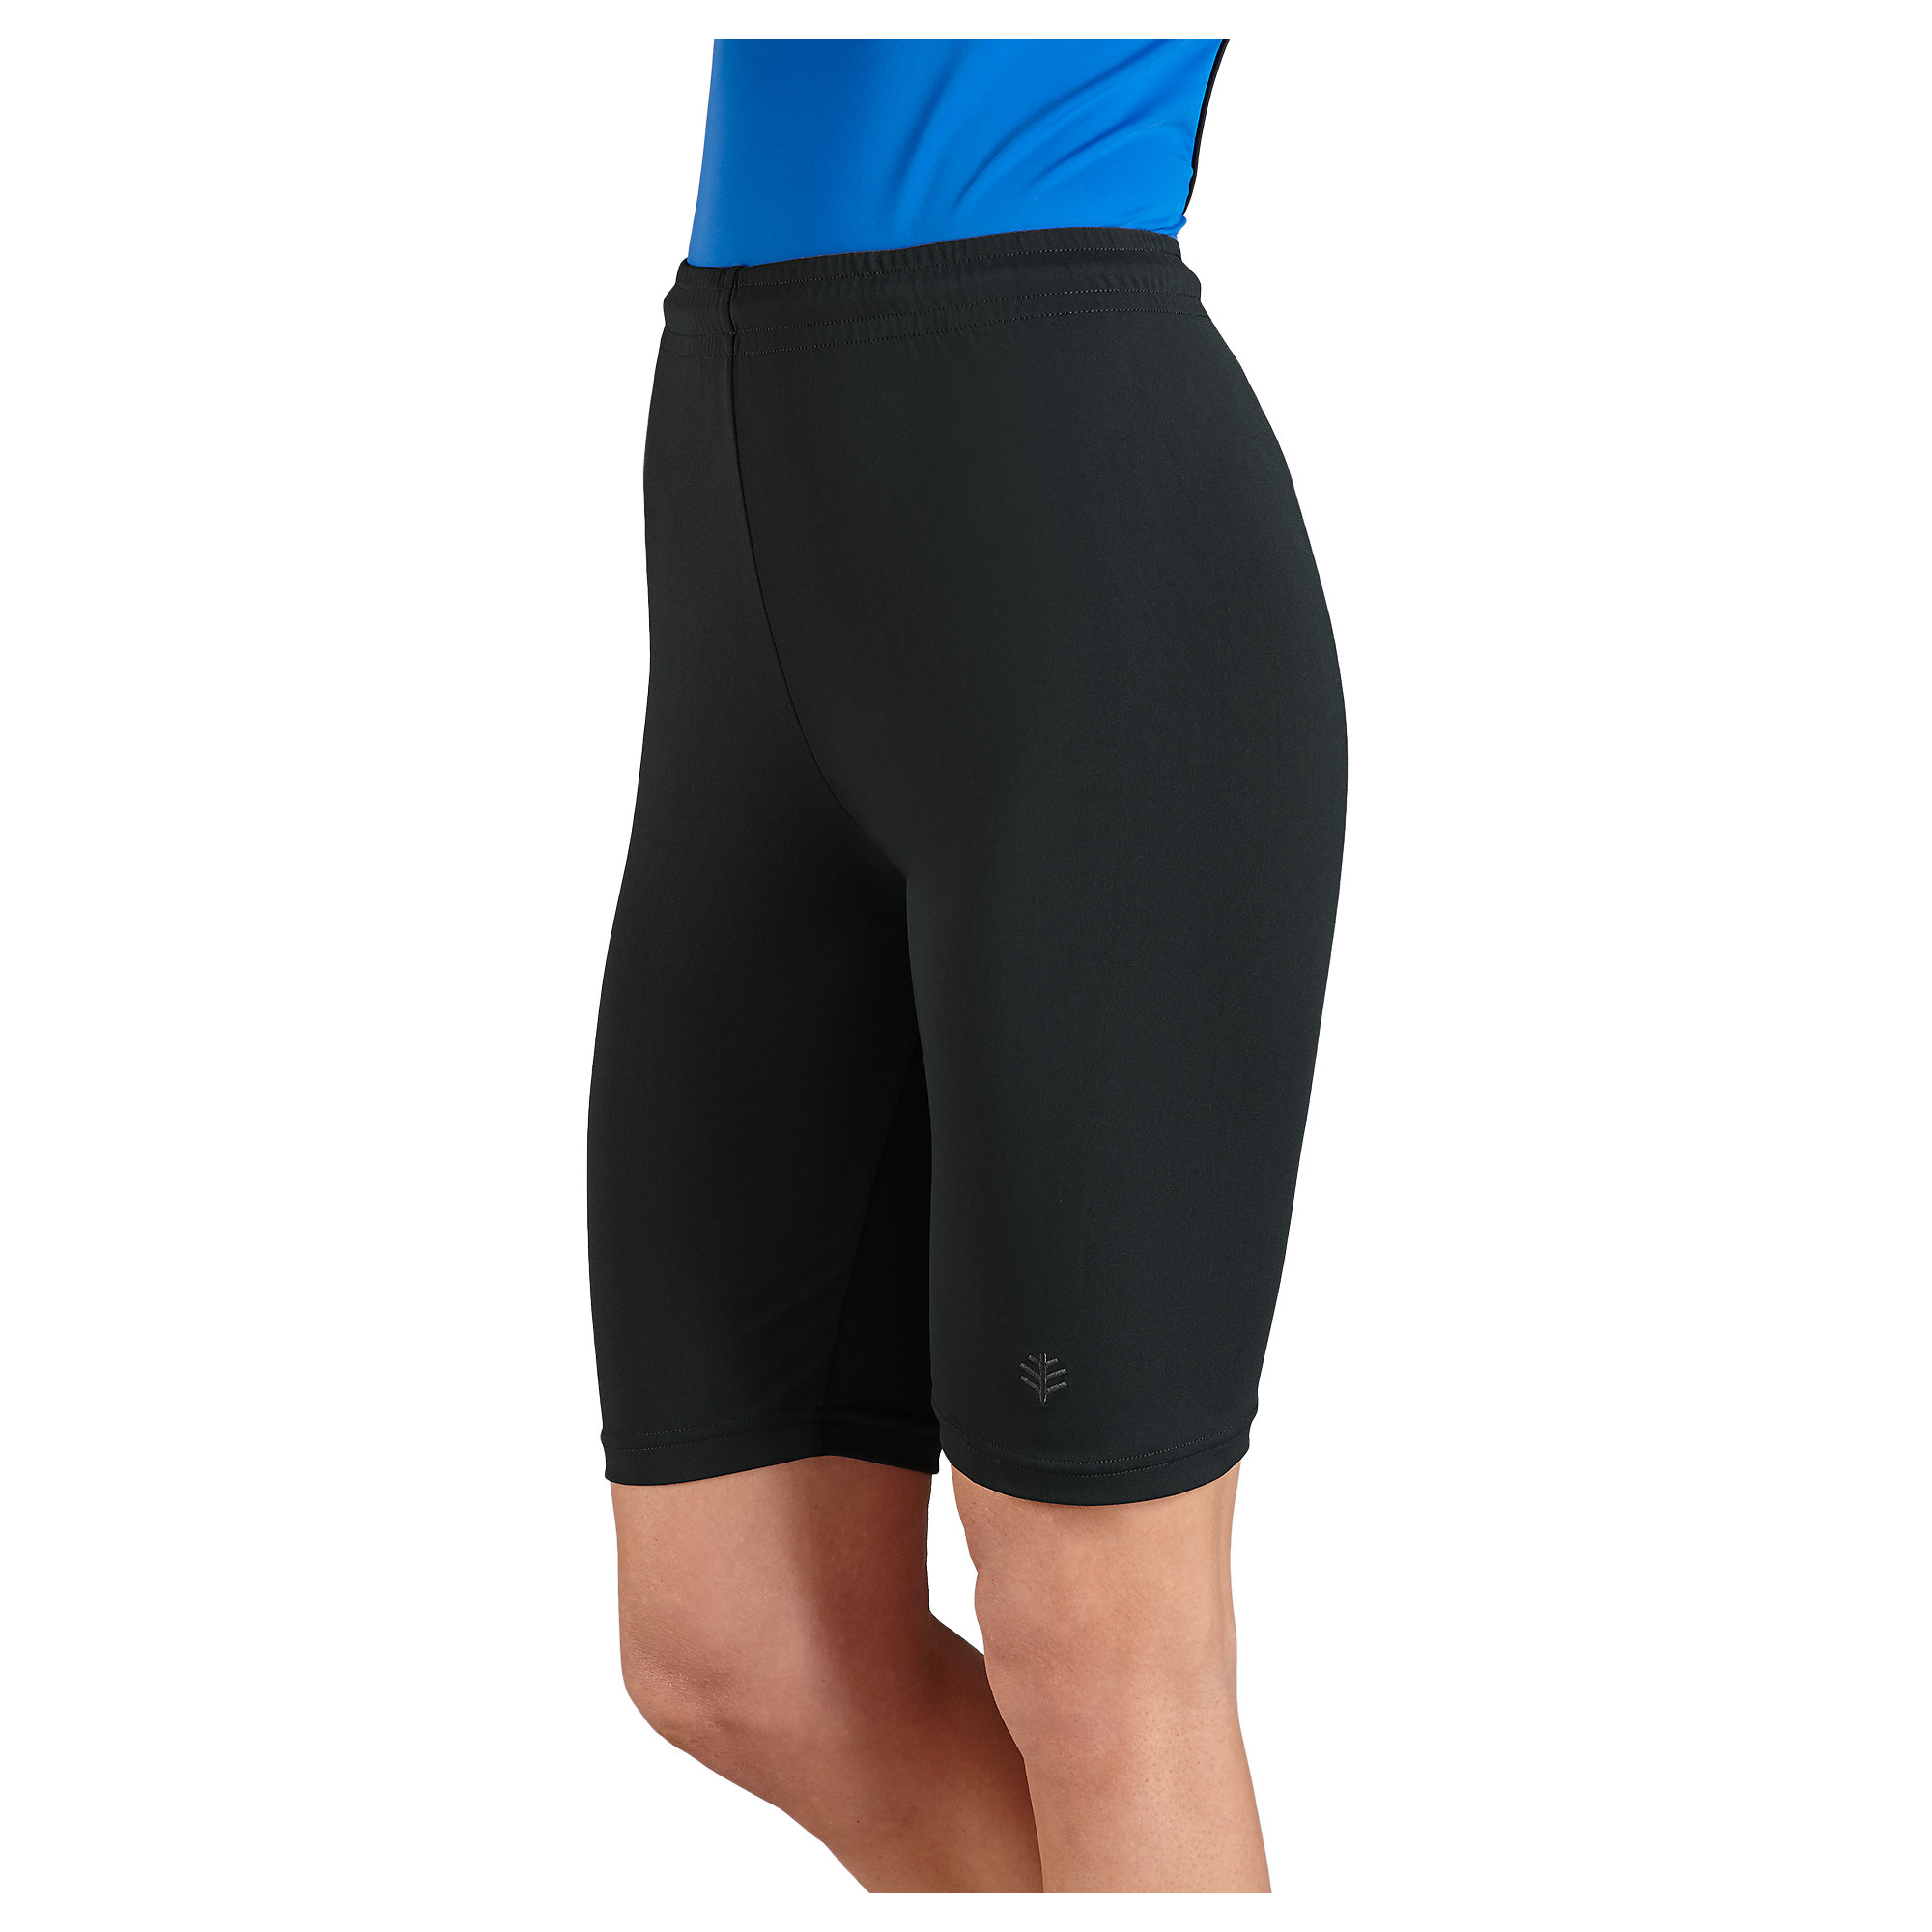 Coolibar upf 50 womens swim shorts sun protection for Women s fishing shorts